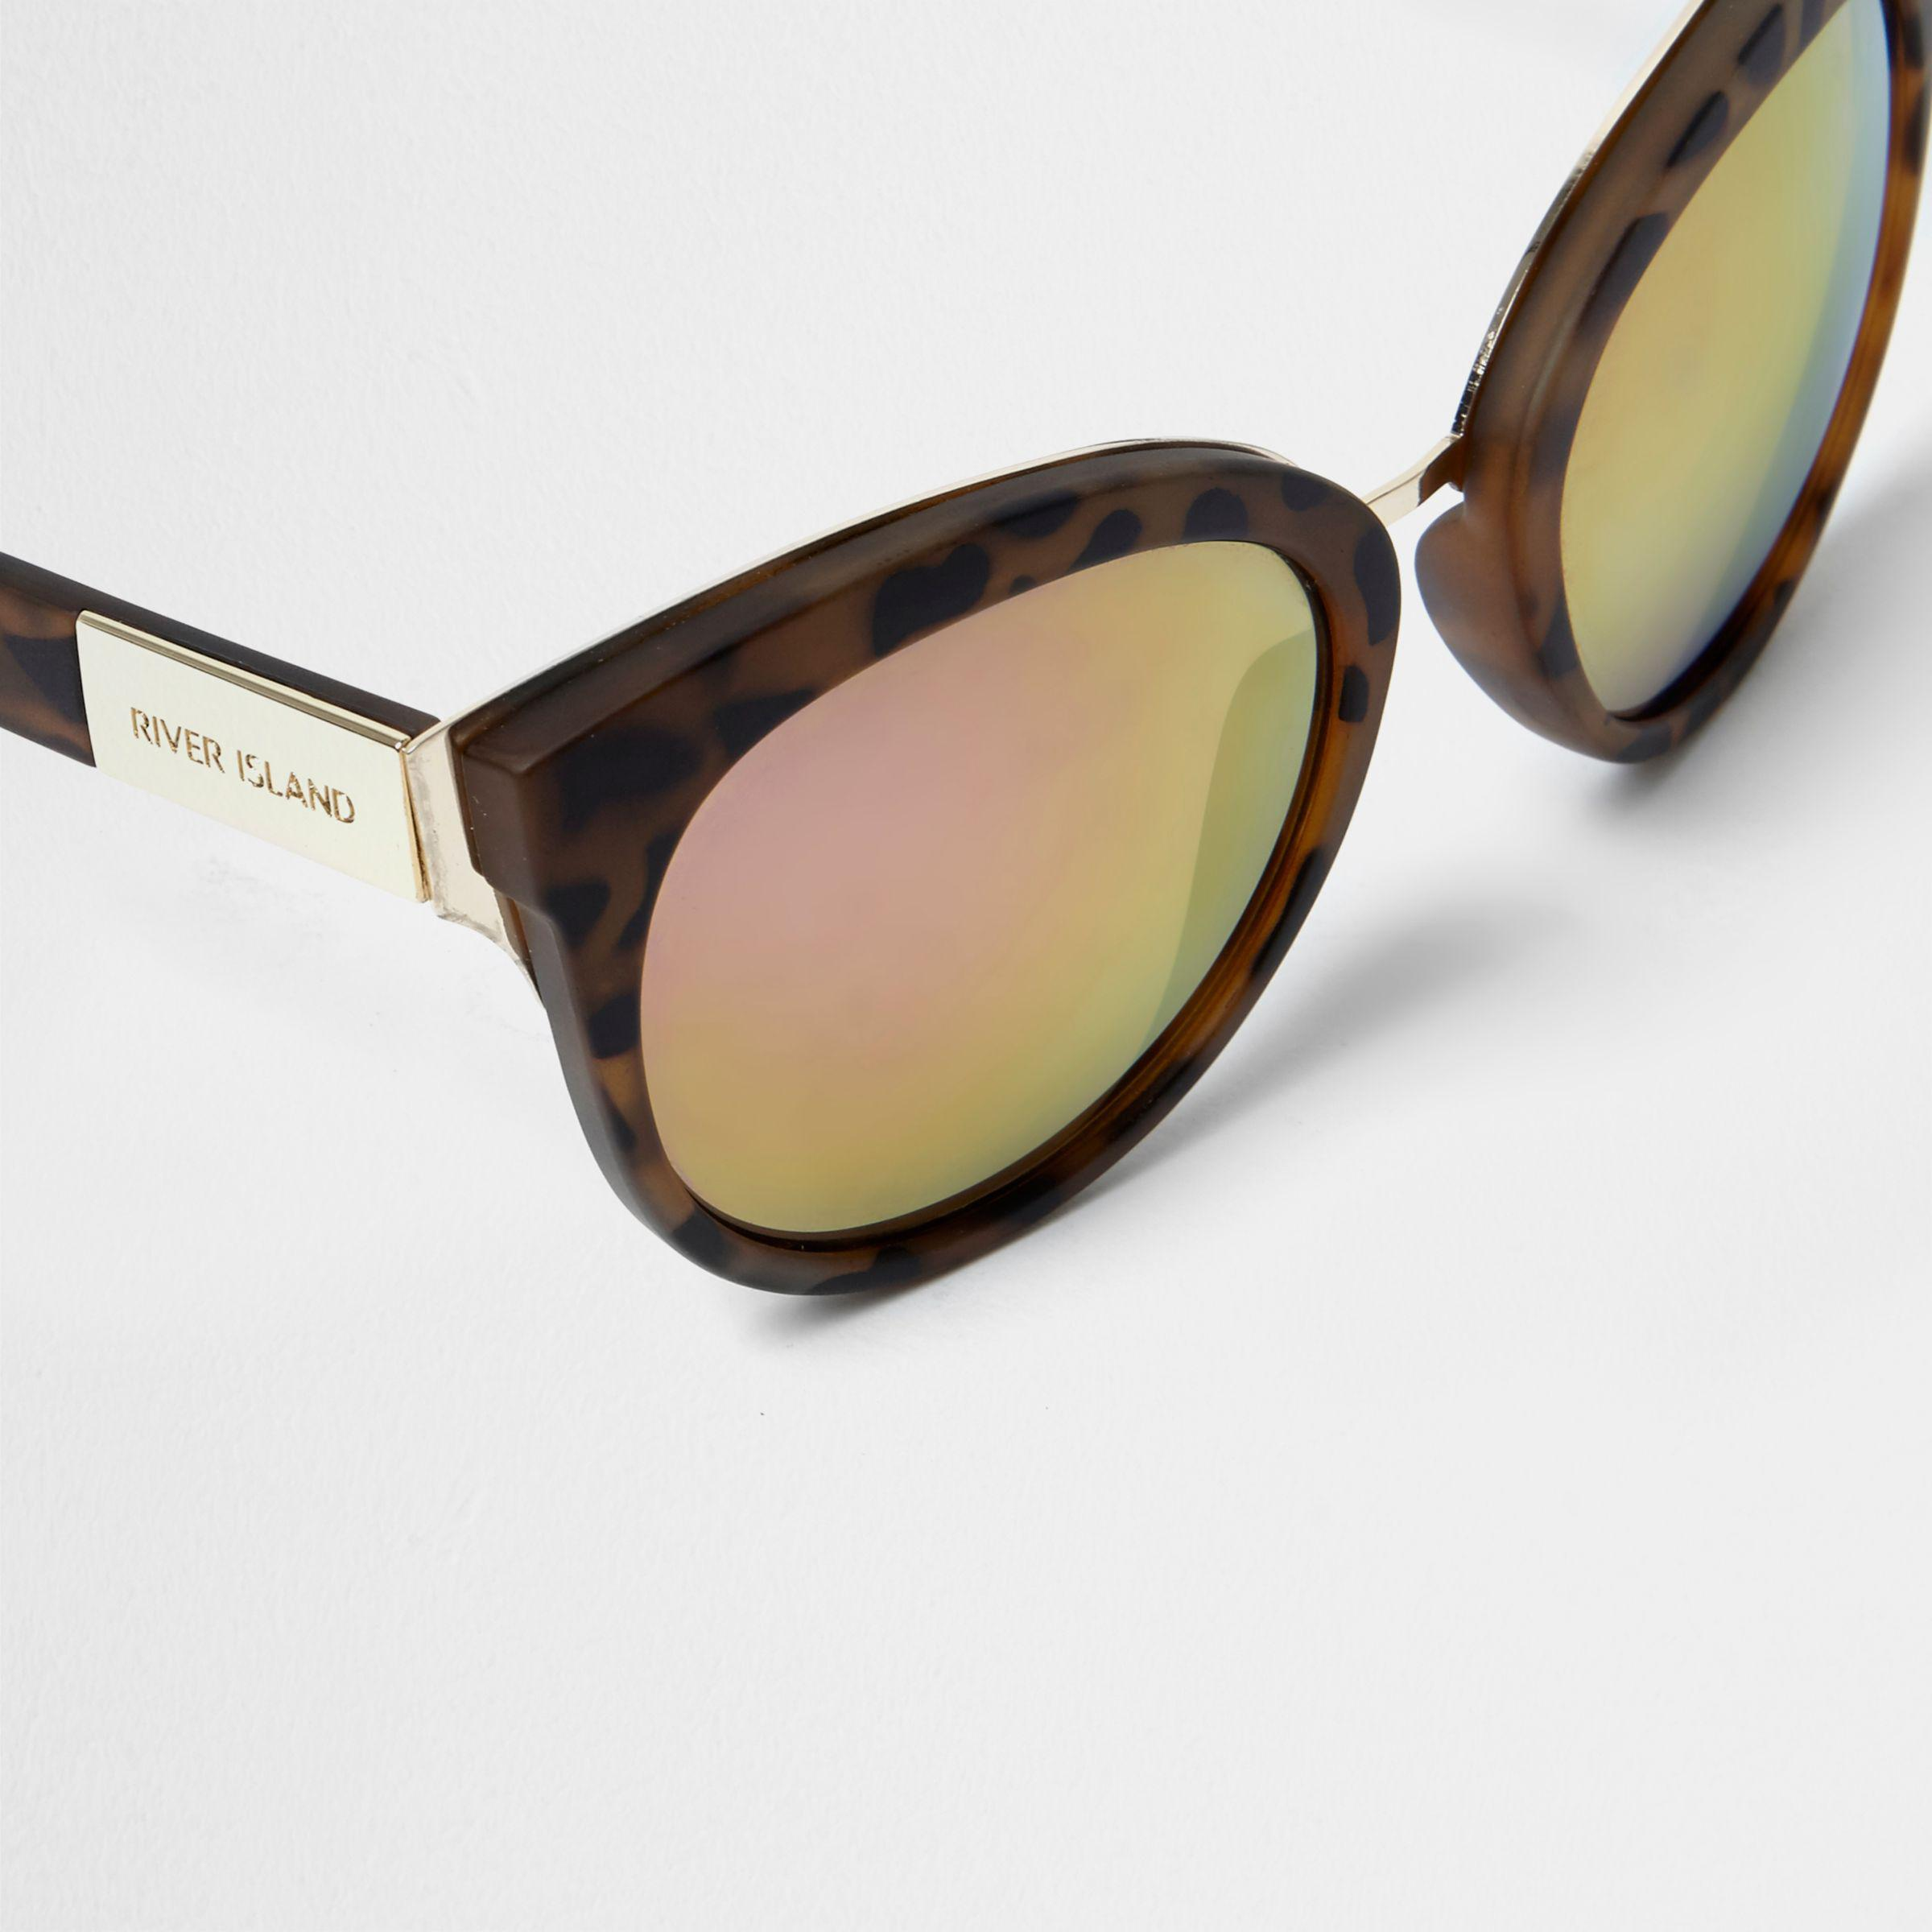 1823554b2e1 Lyst - River Island Khaki Leopard Print Cat Eye Sunglasses